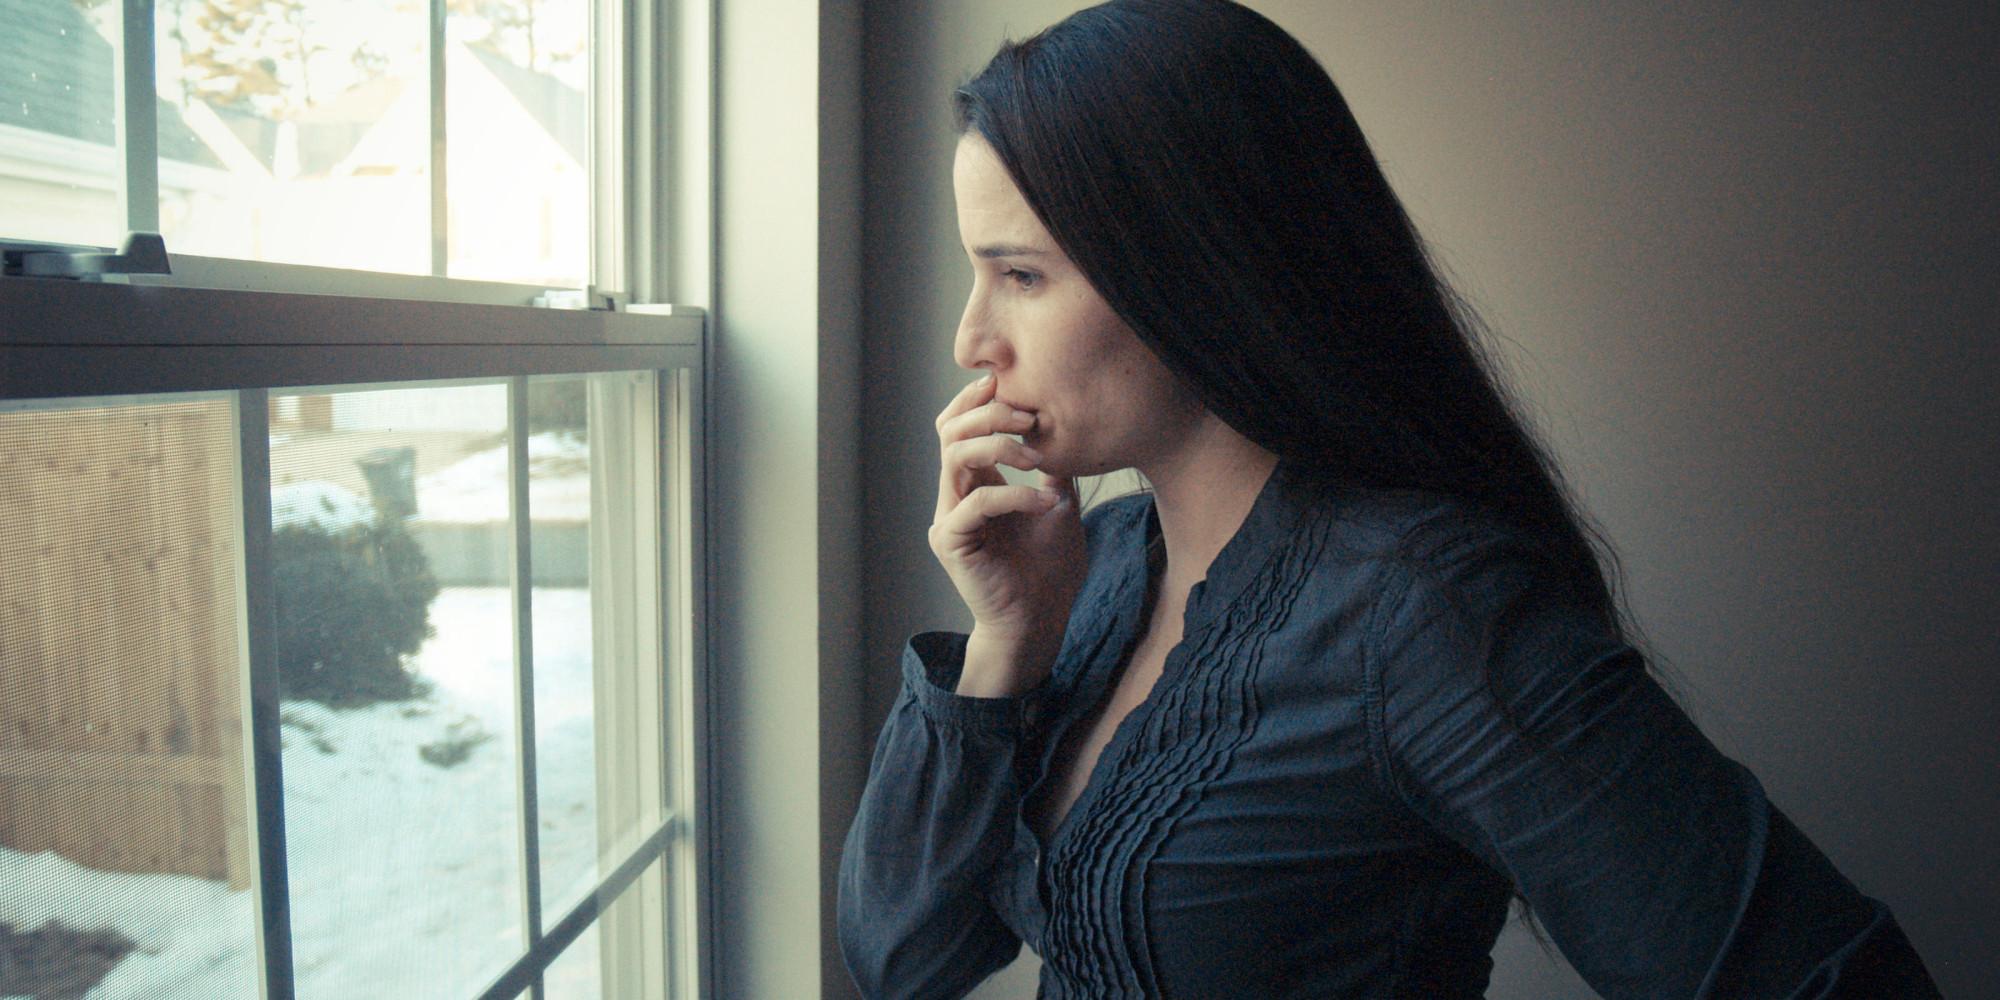 depressed woman ile ilgili görsel sonucu